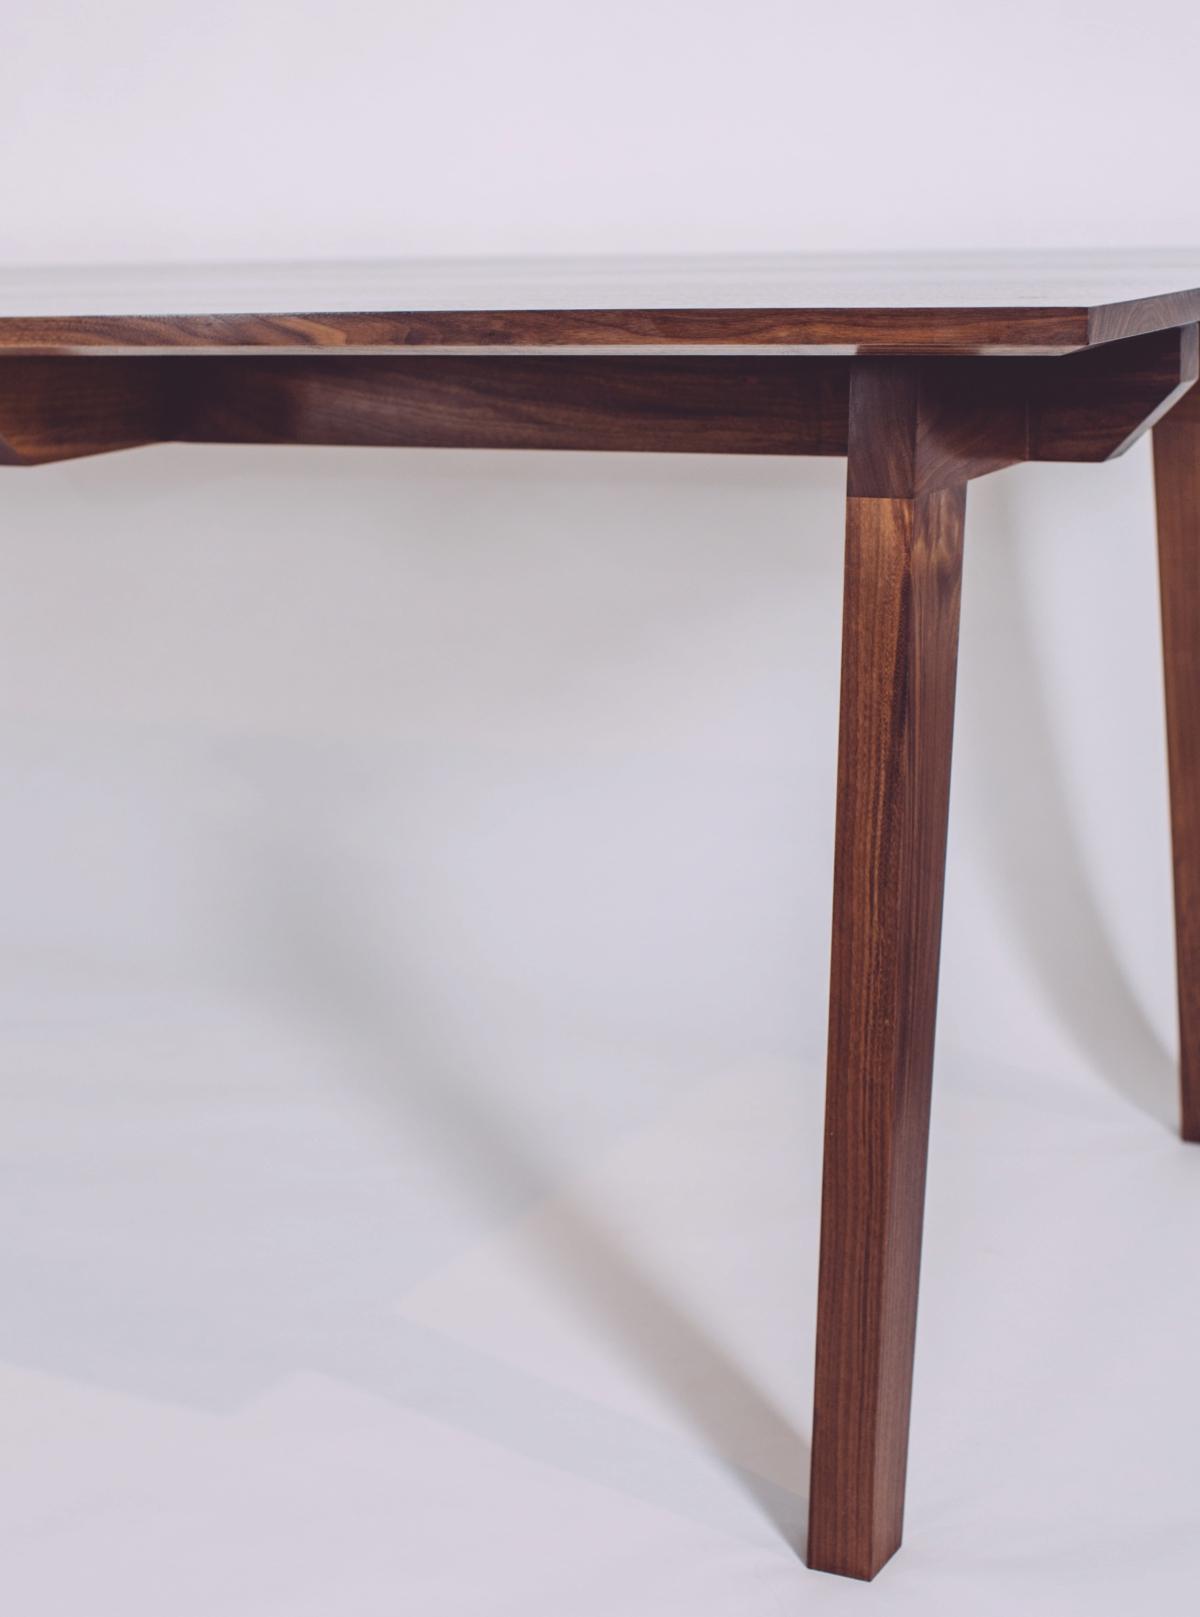 skana table_192356.jpg